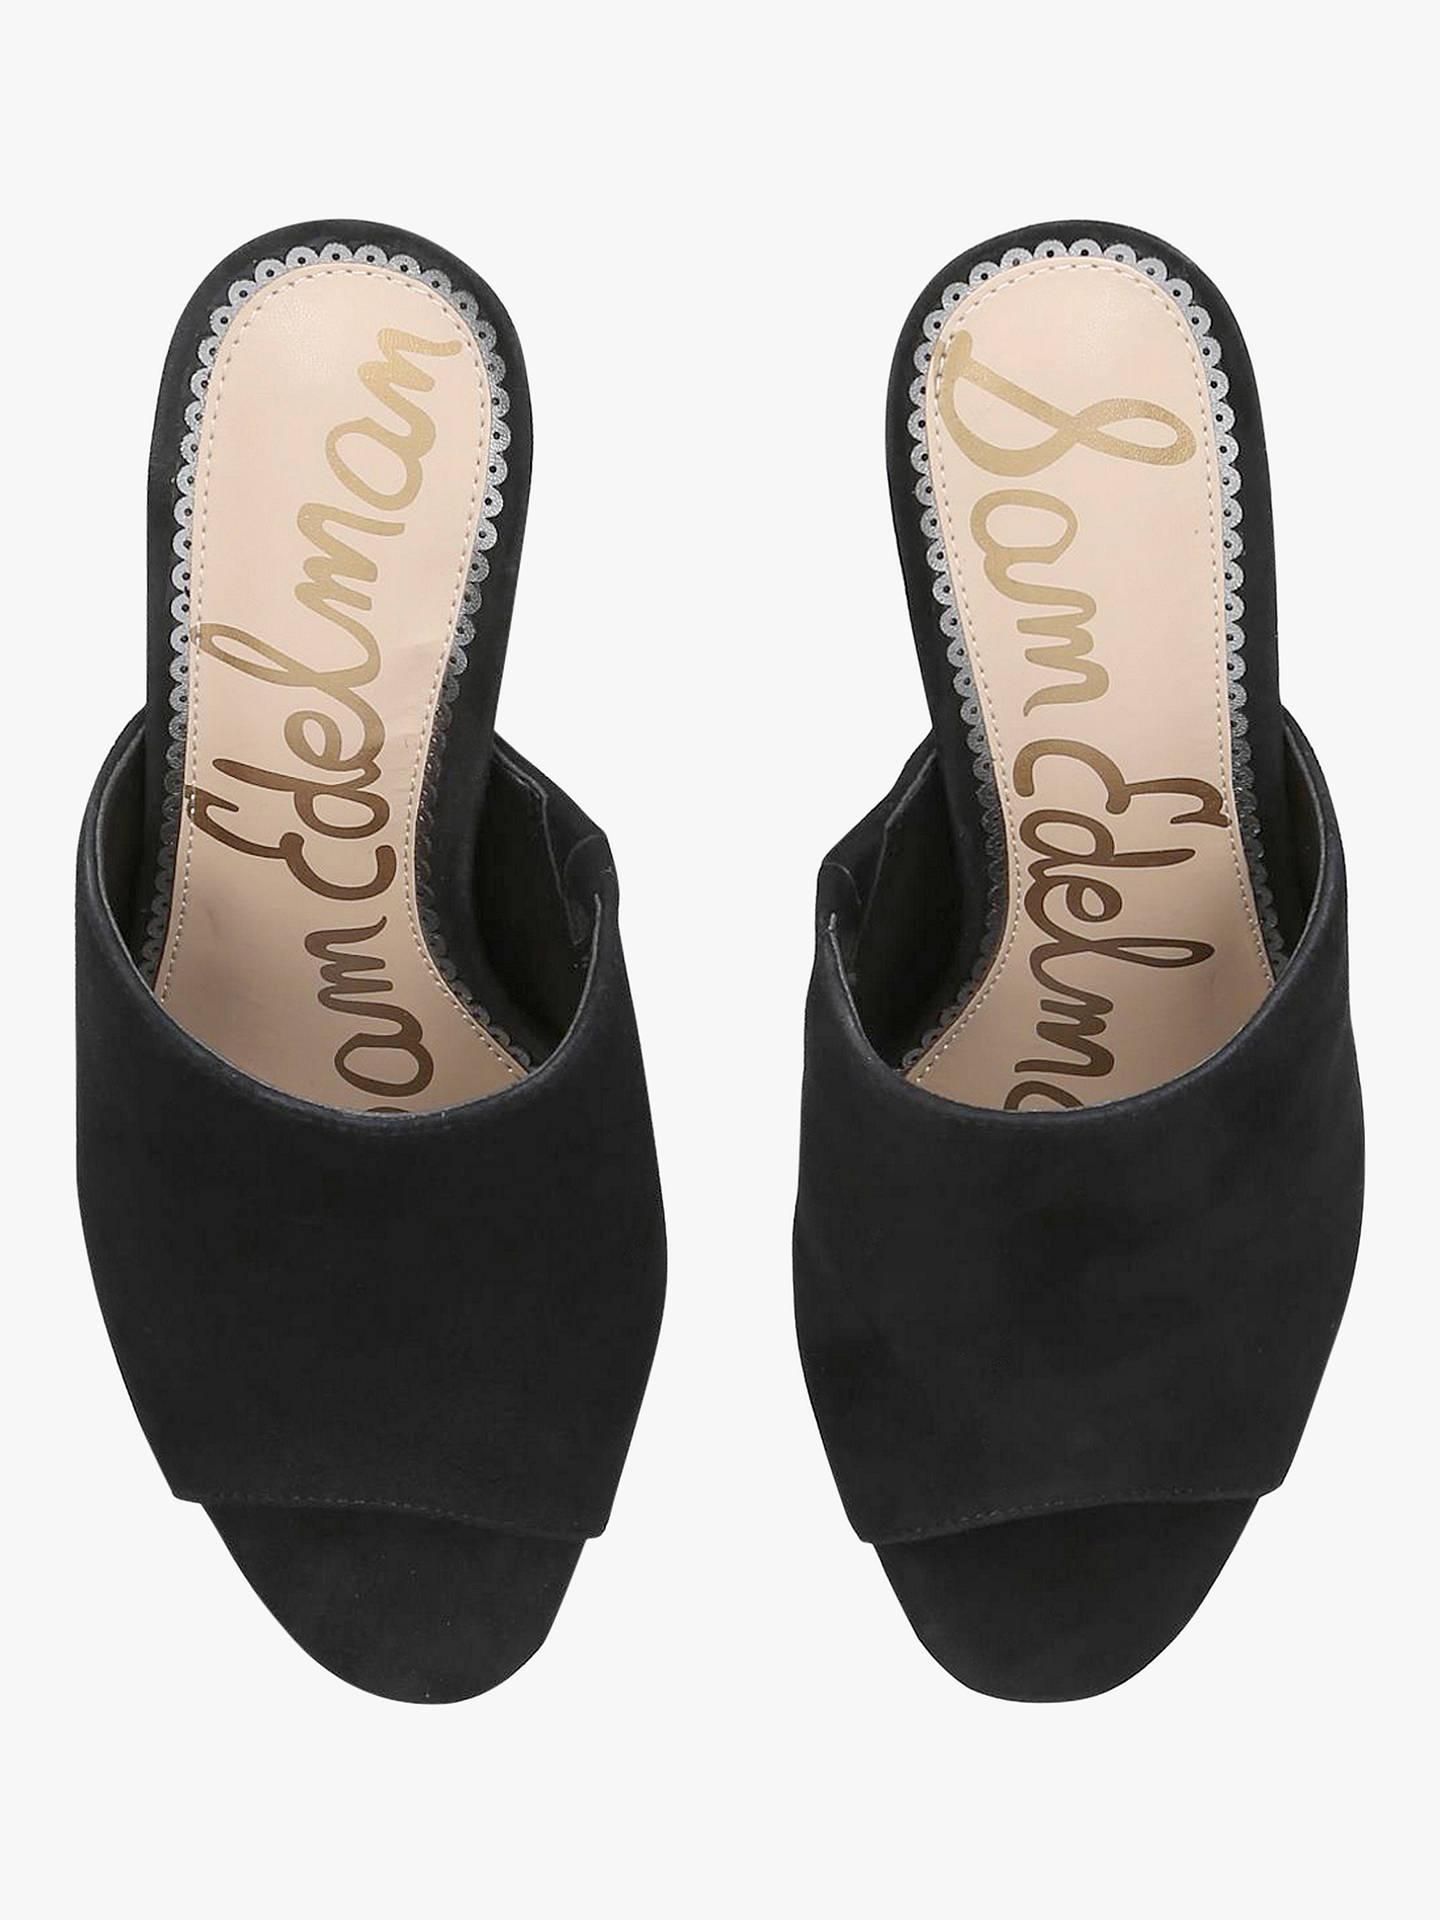 c1cc72a156f Sam Edelman Orlie Suede Block Heel Mule Sandals, Black at John Lewis ...